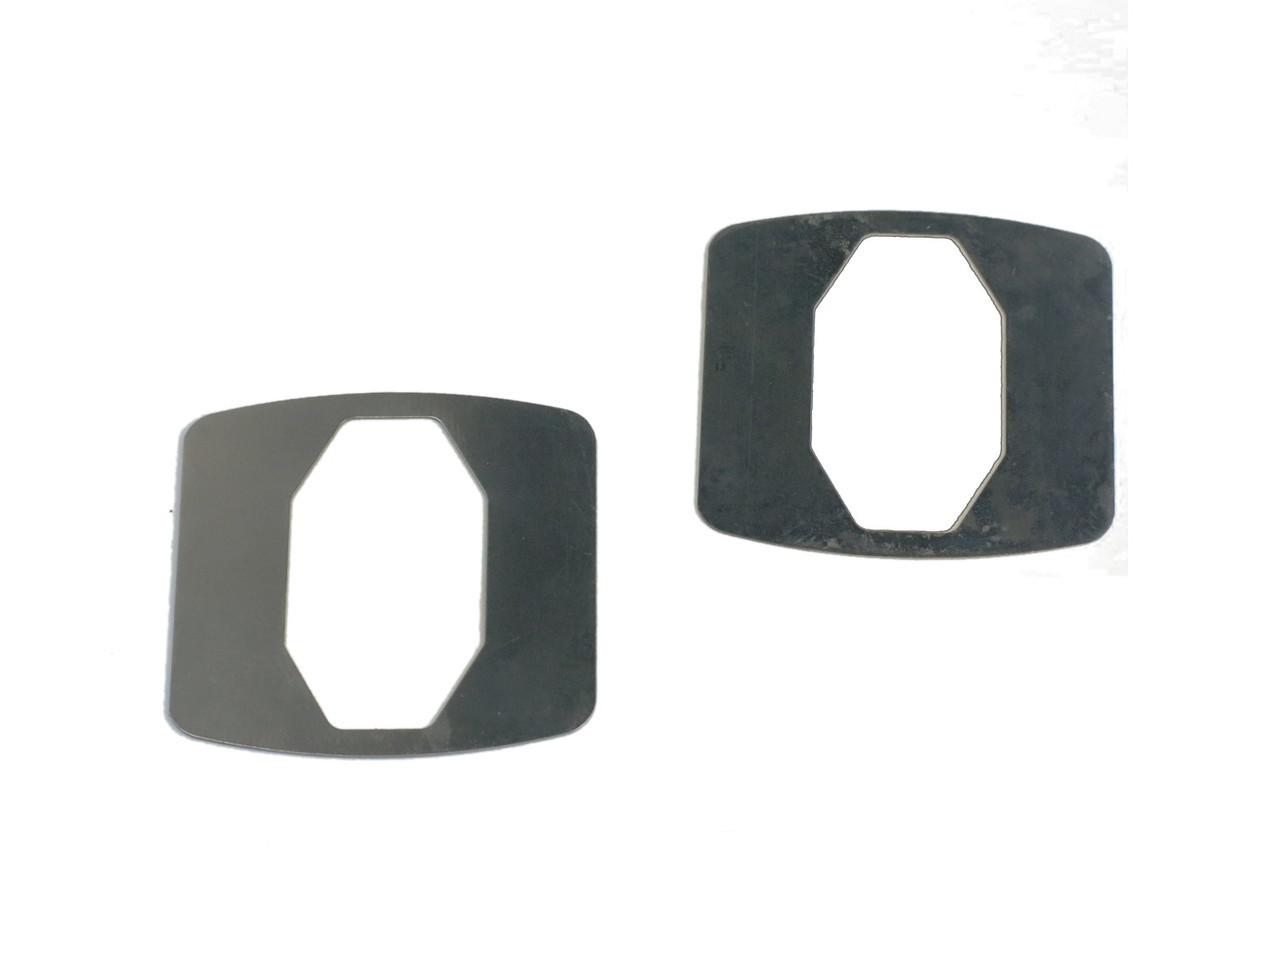 Sidi Reinforcement Plates - BikeShoes.com